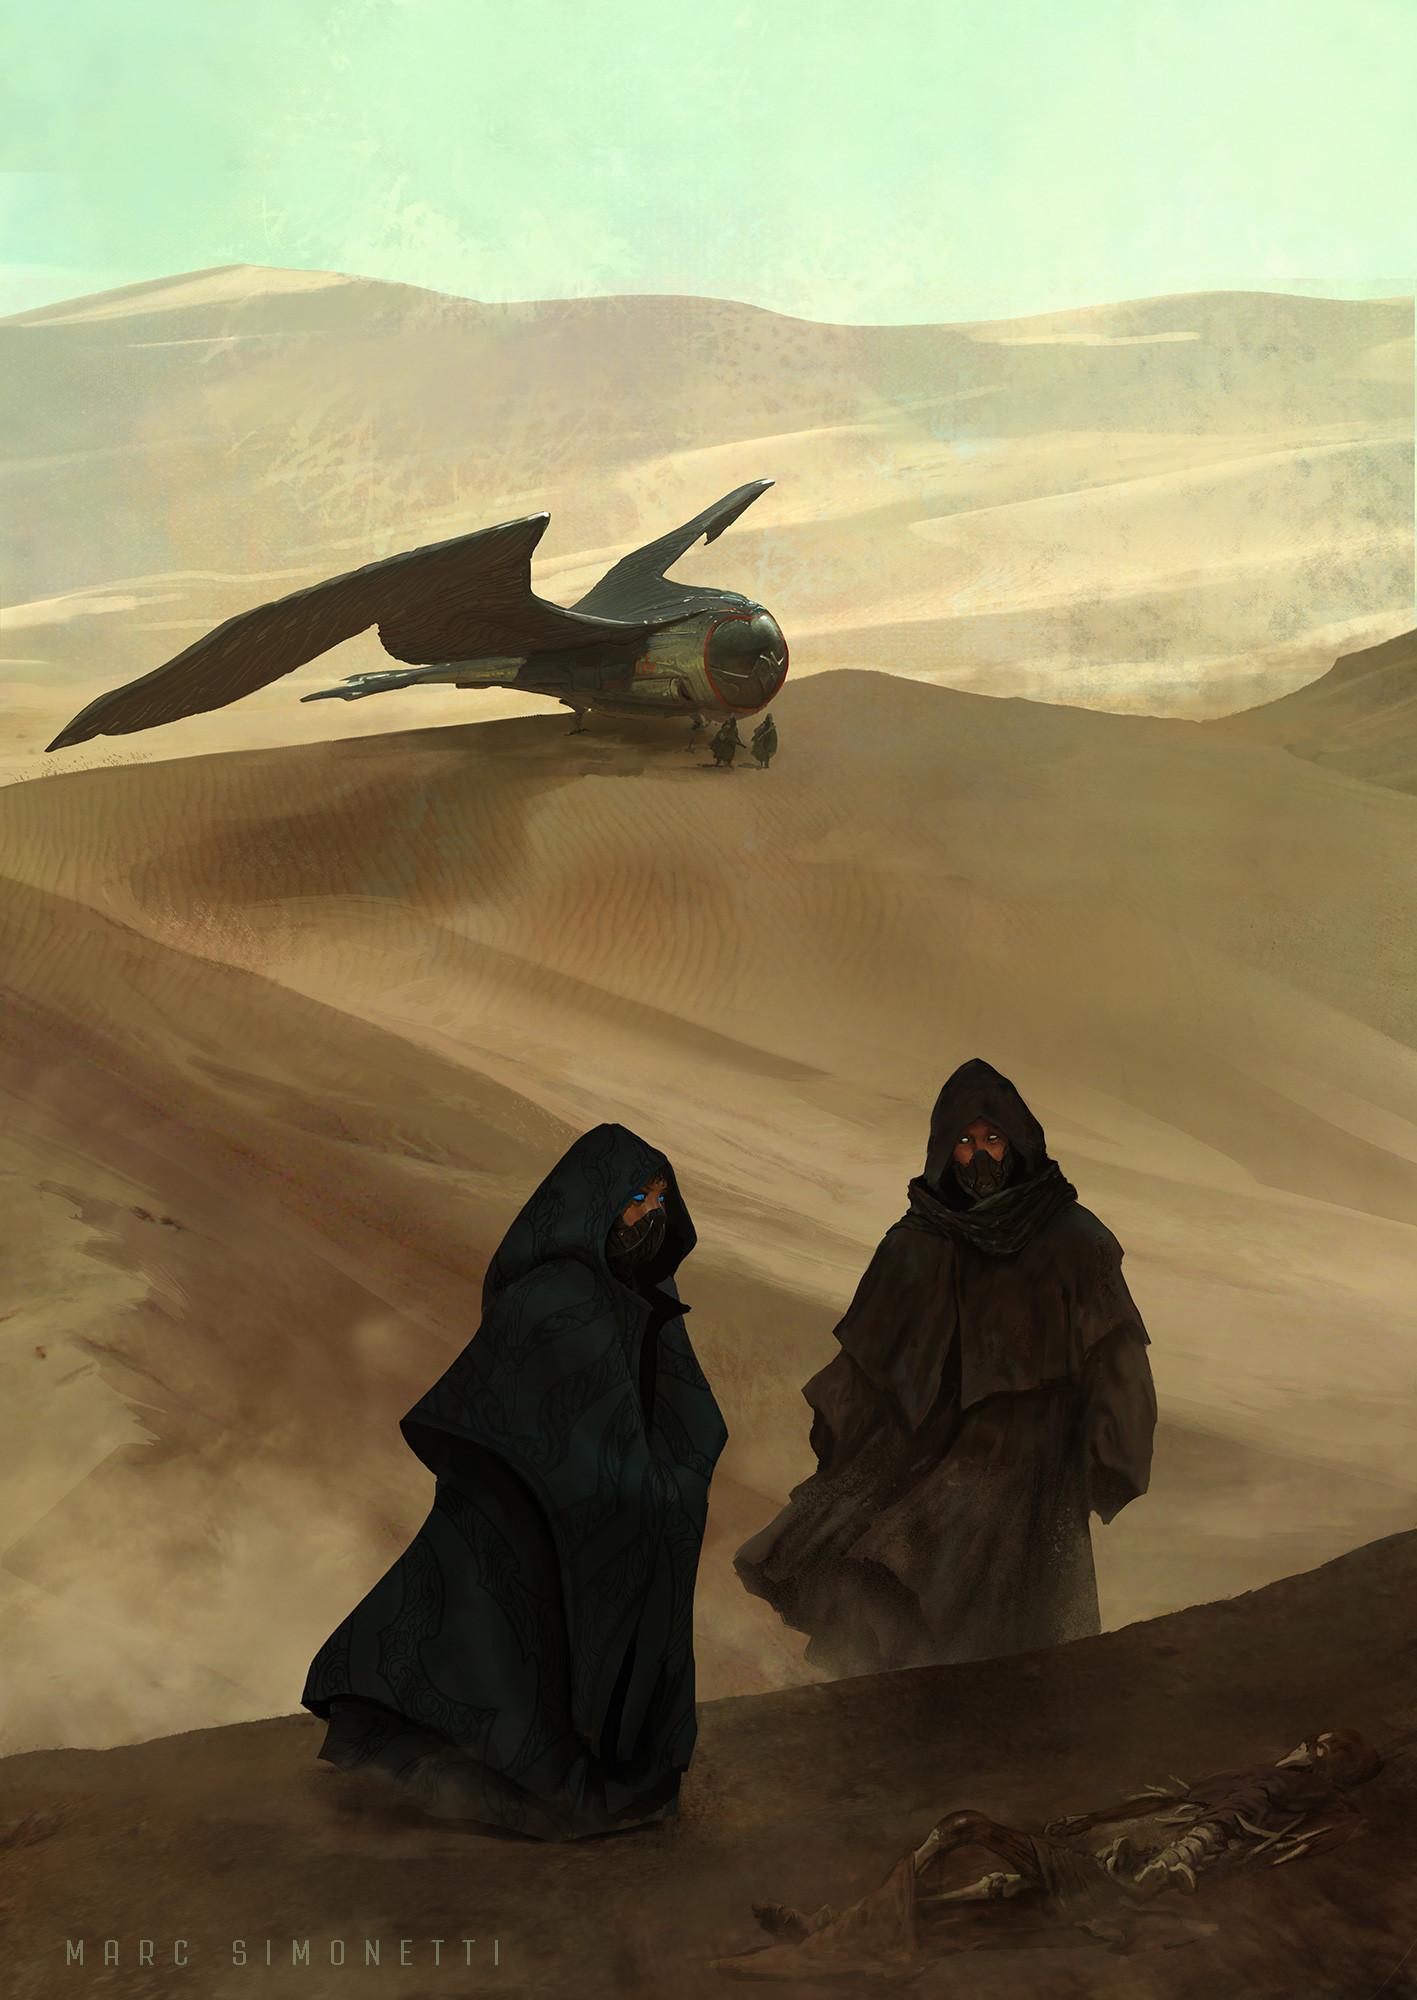 General 1417x2000 Marc Simonetti dunes illustration alia atreides hayt